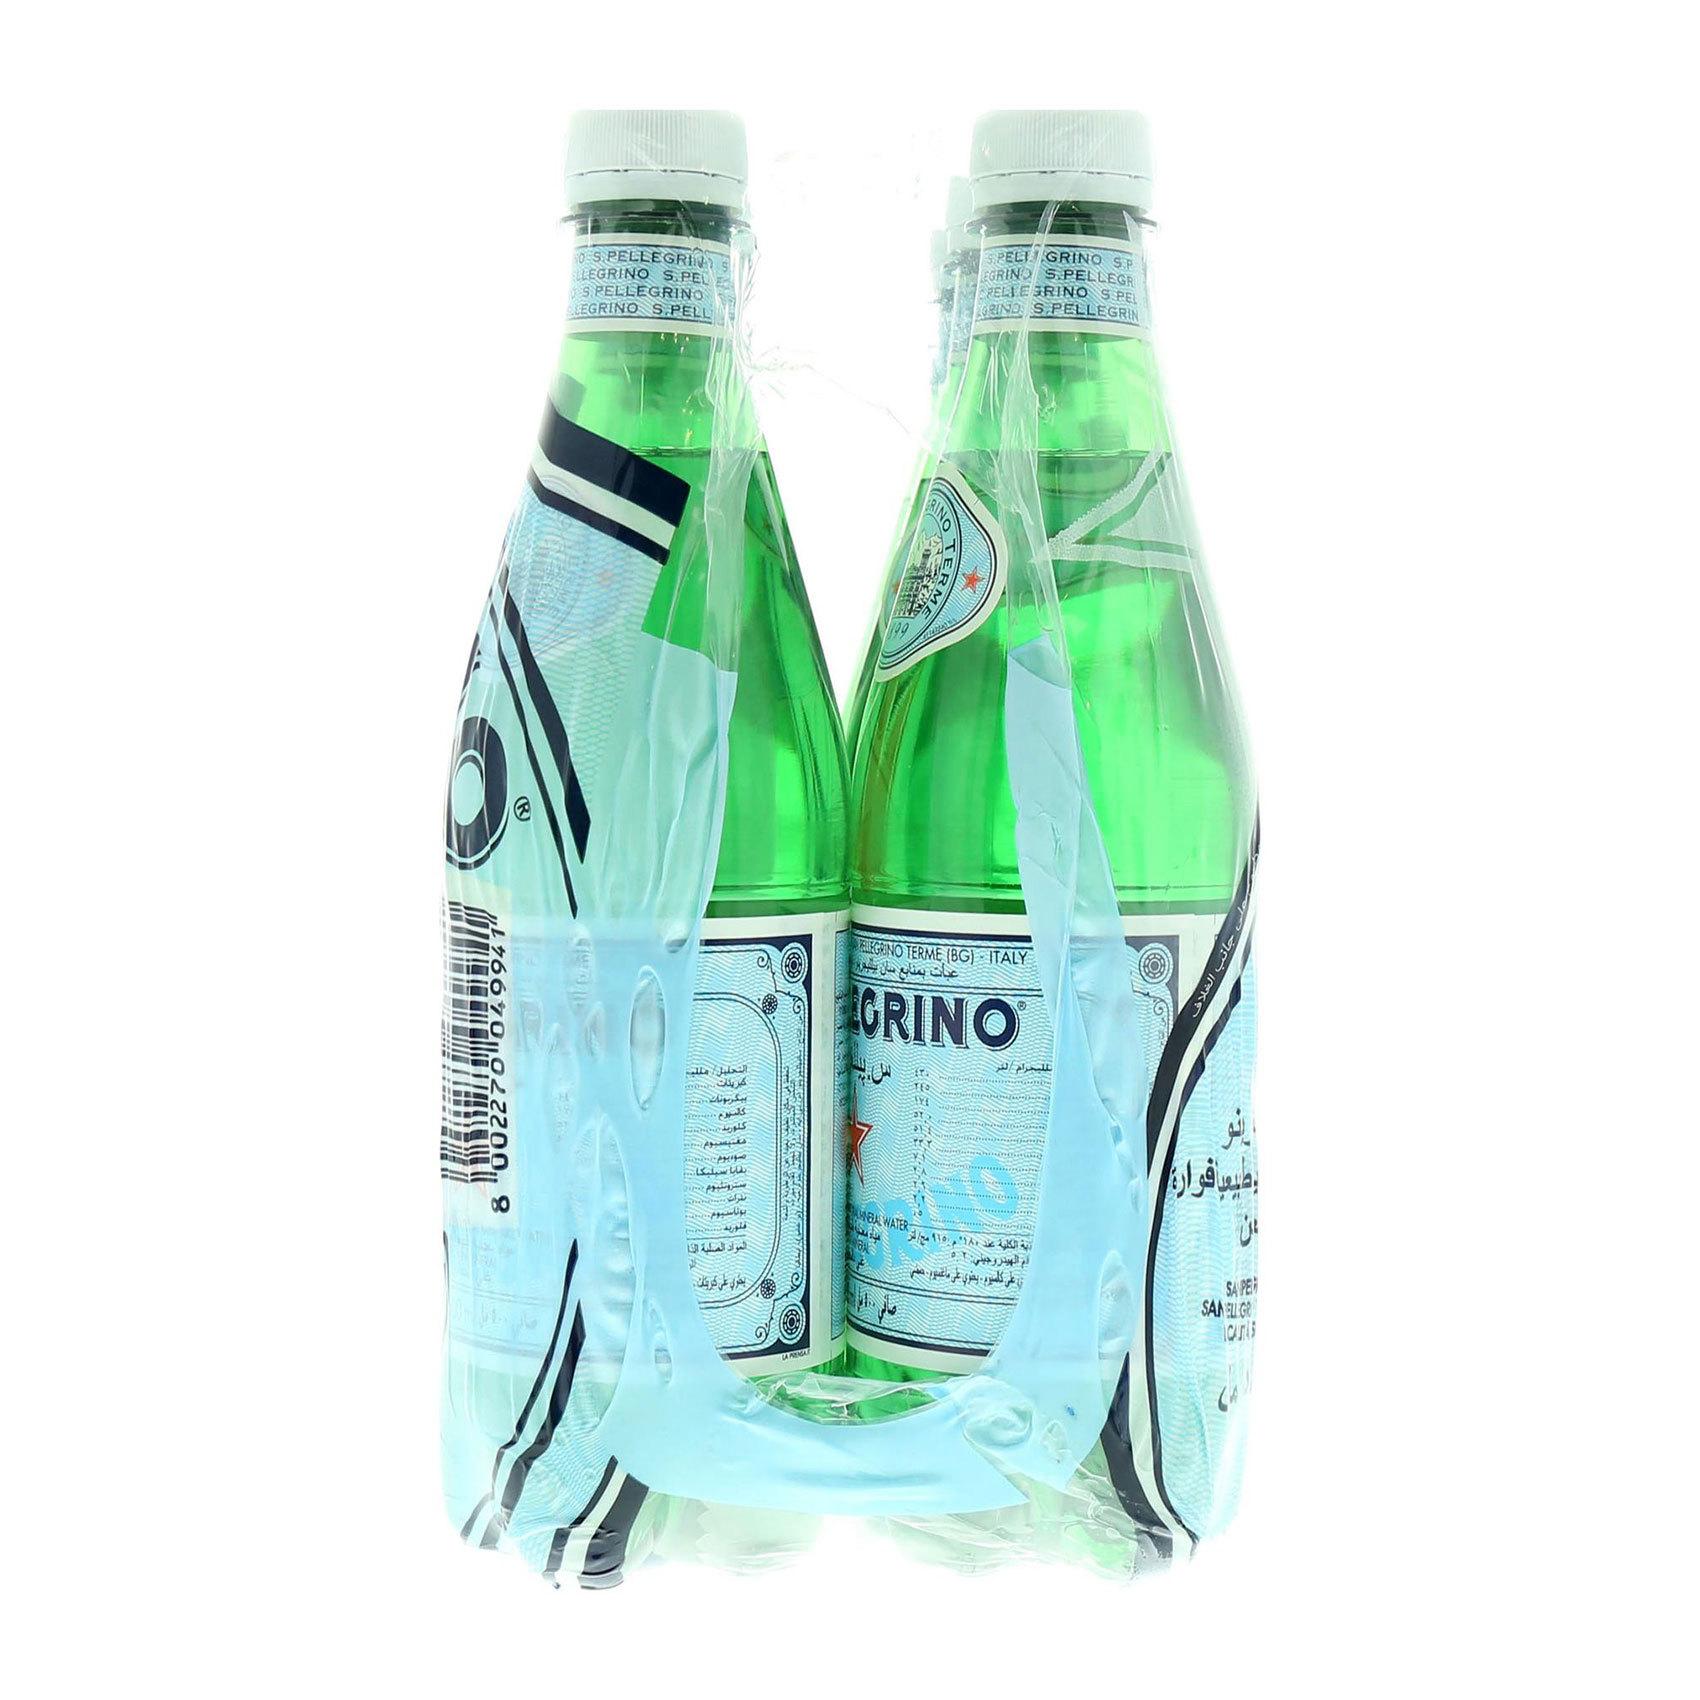 SAN PELLEGRINO SPARK/WATER 0.5LX6